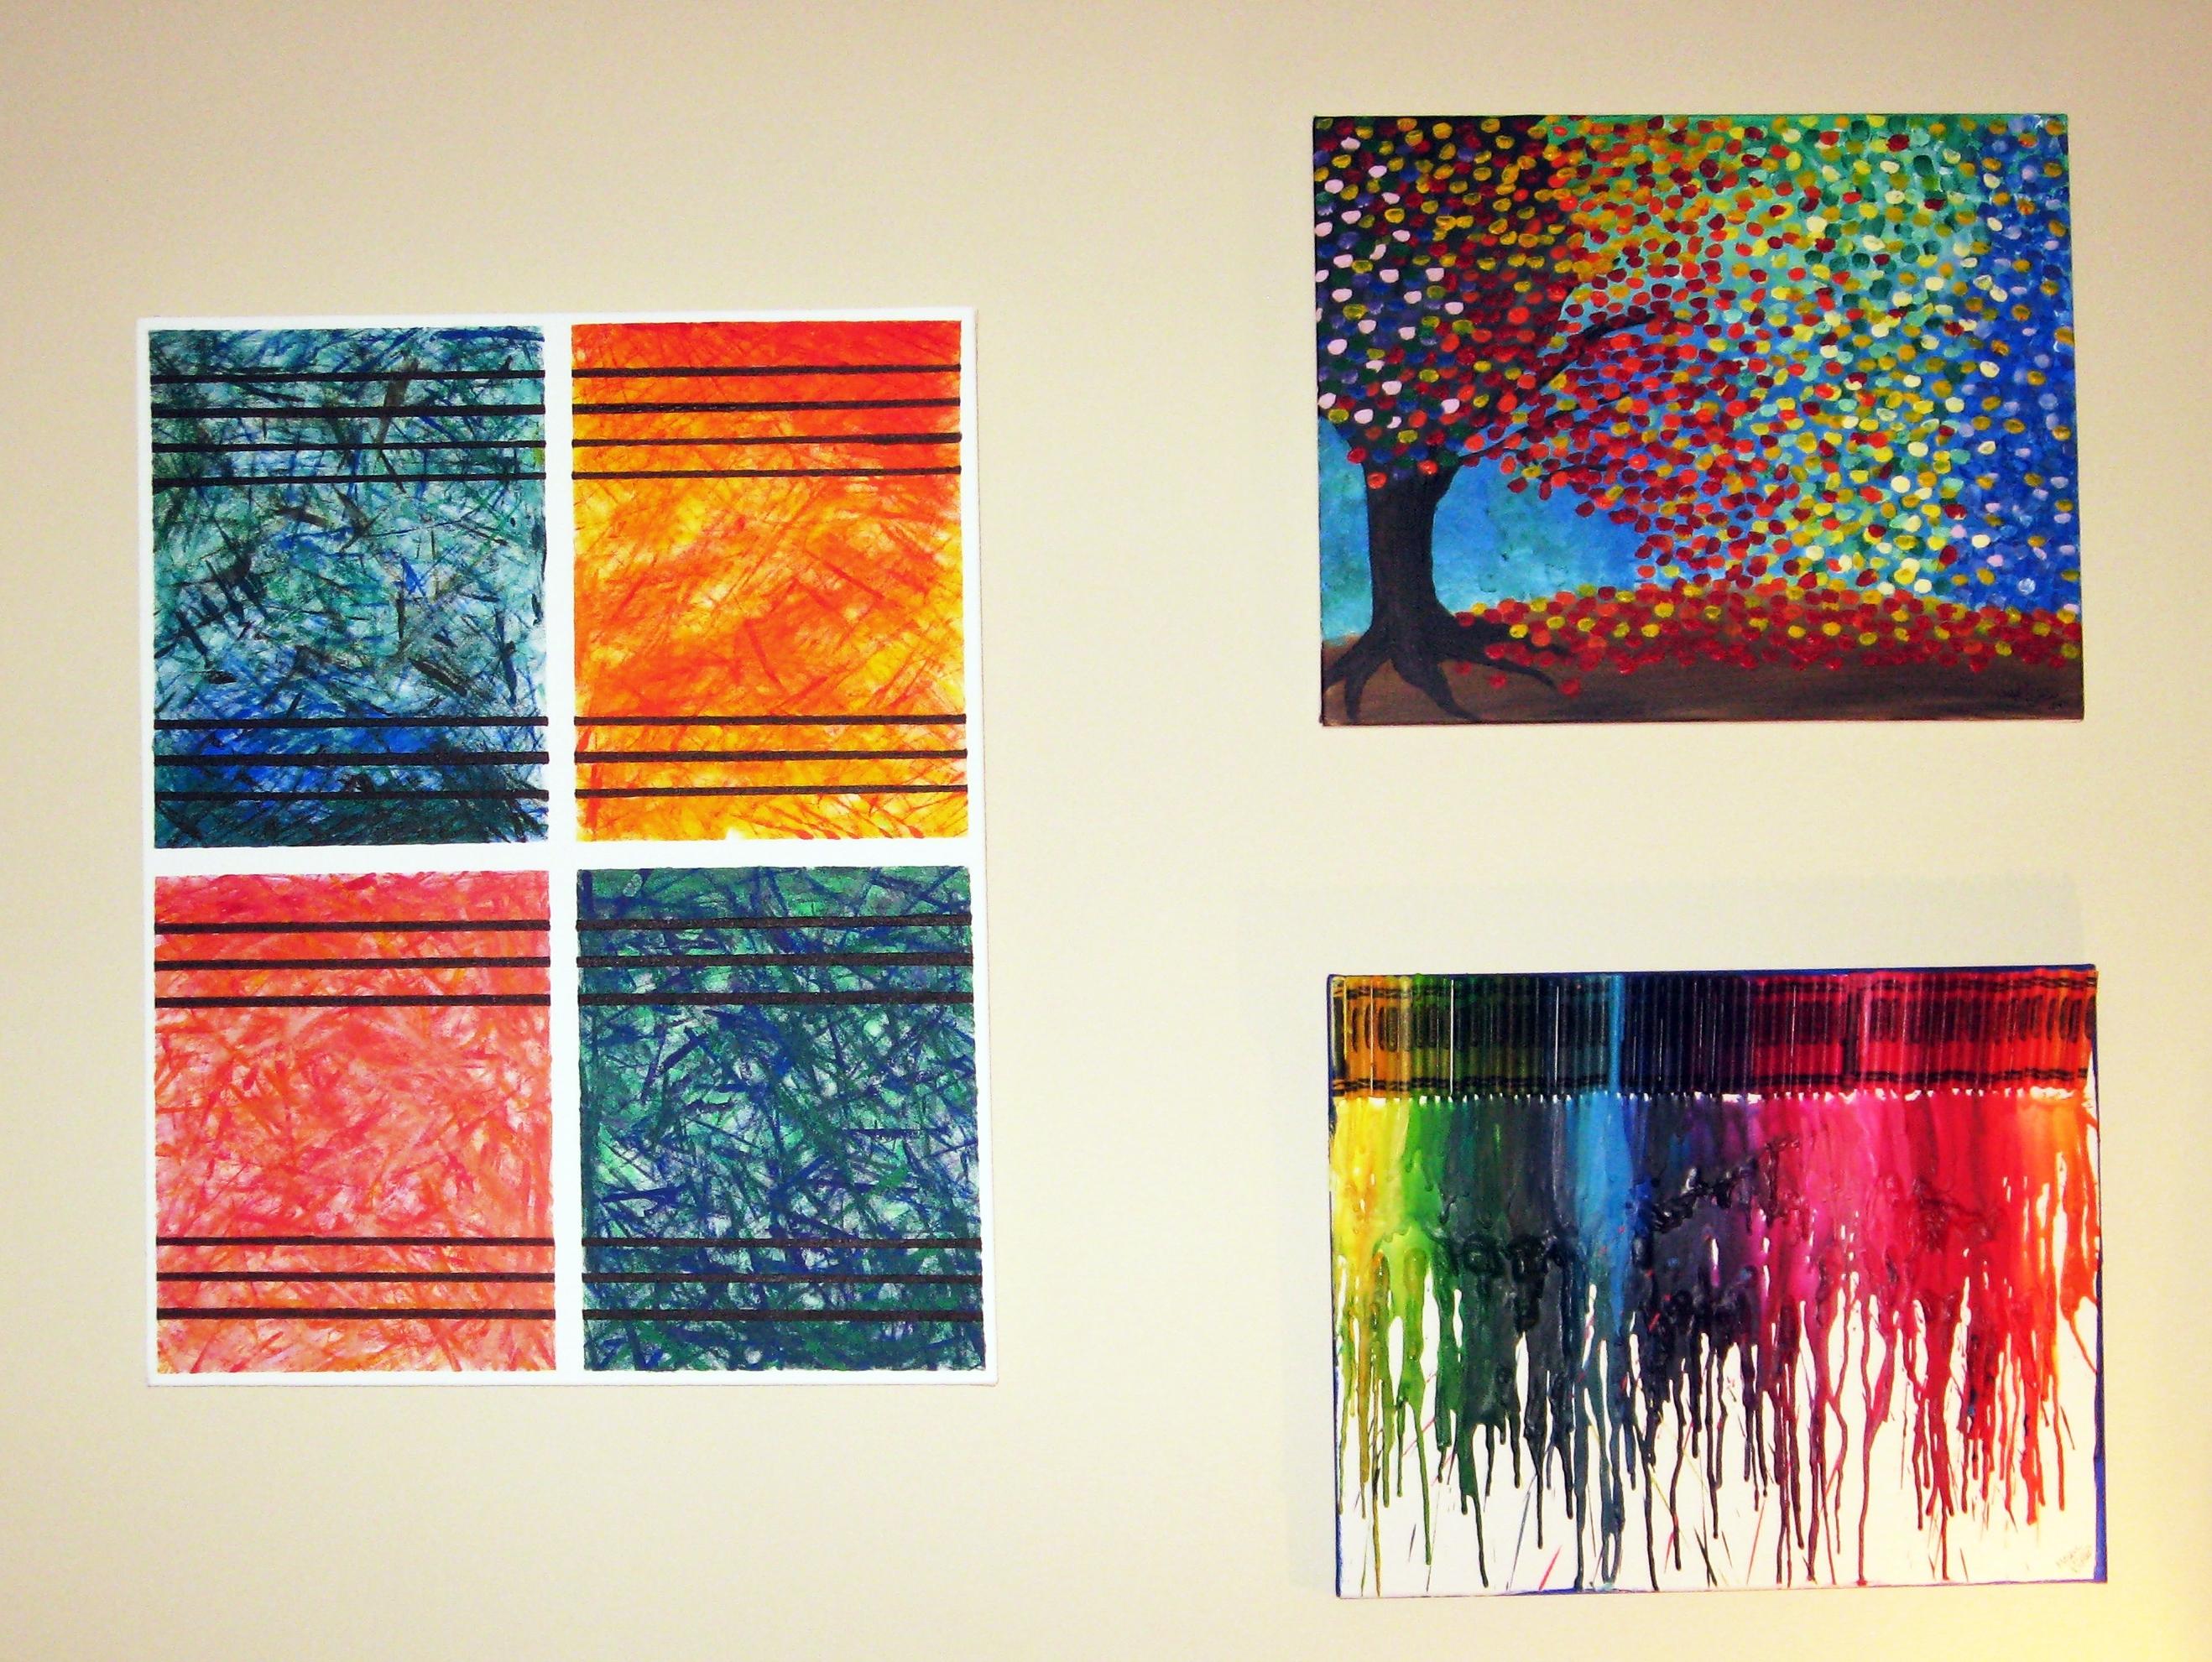 Diy Abstract Wall Art | Make Something Mondays! within Abstract Wall Art (Image 11 of 20)